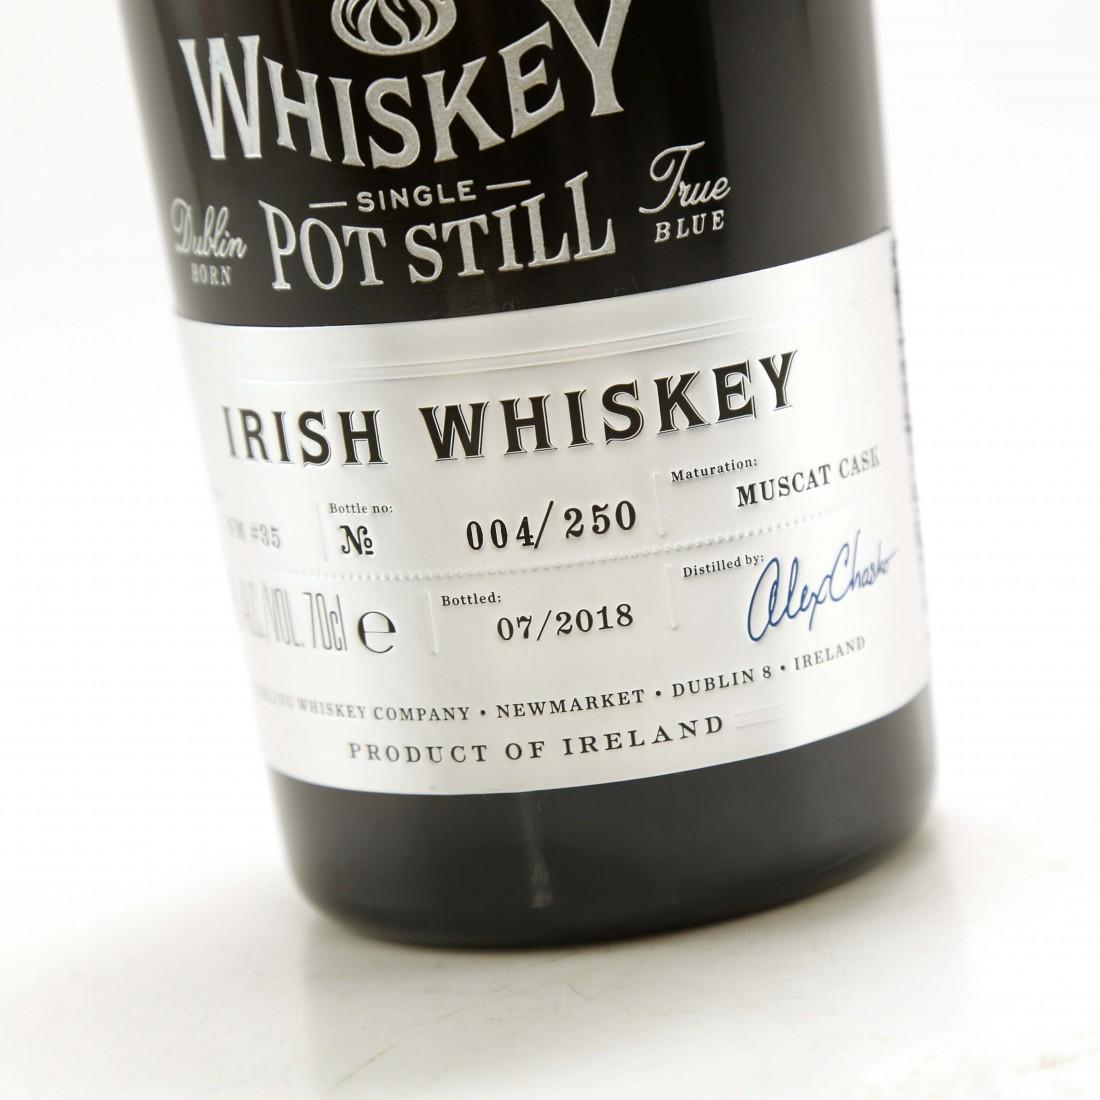 Teeling Celebratory Single Pot Still Whiskey / Bottle #004